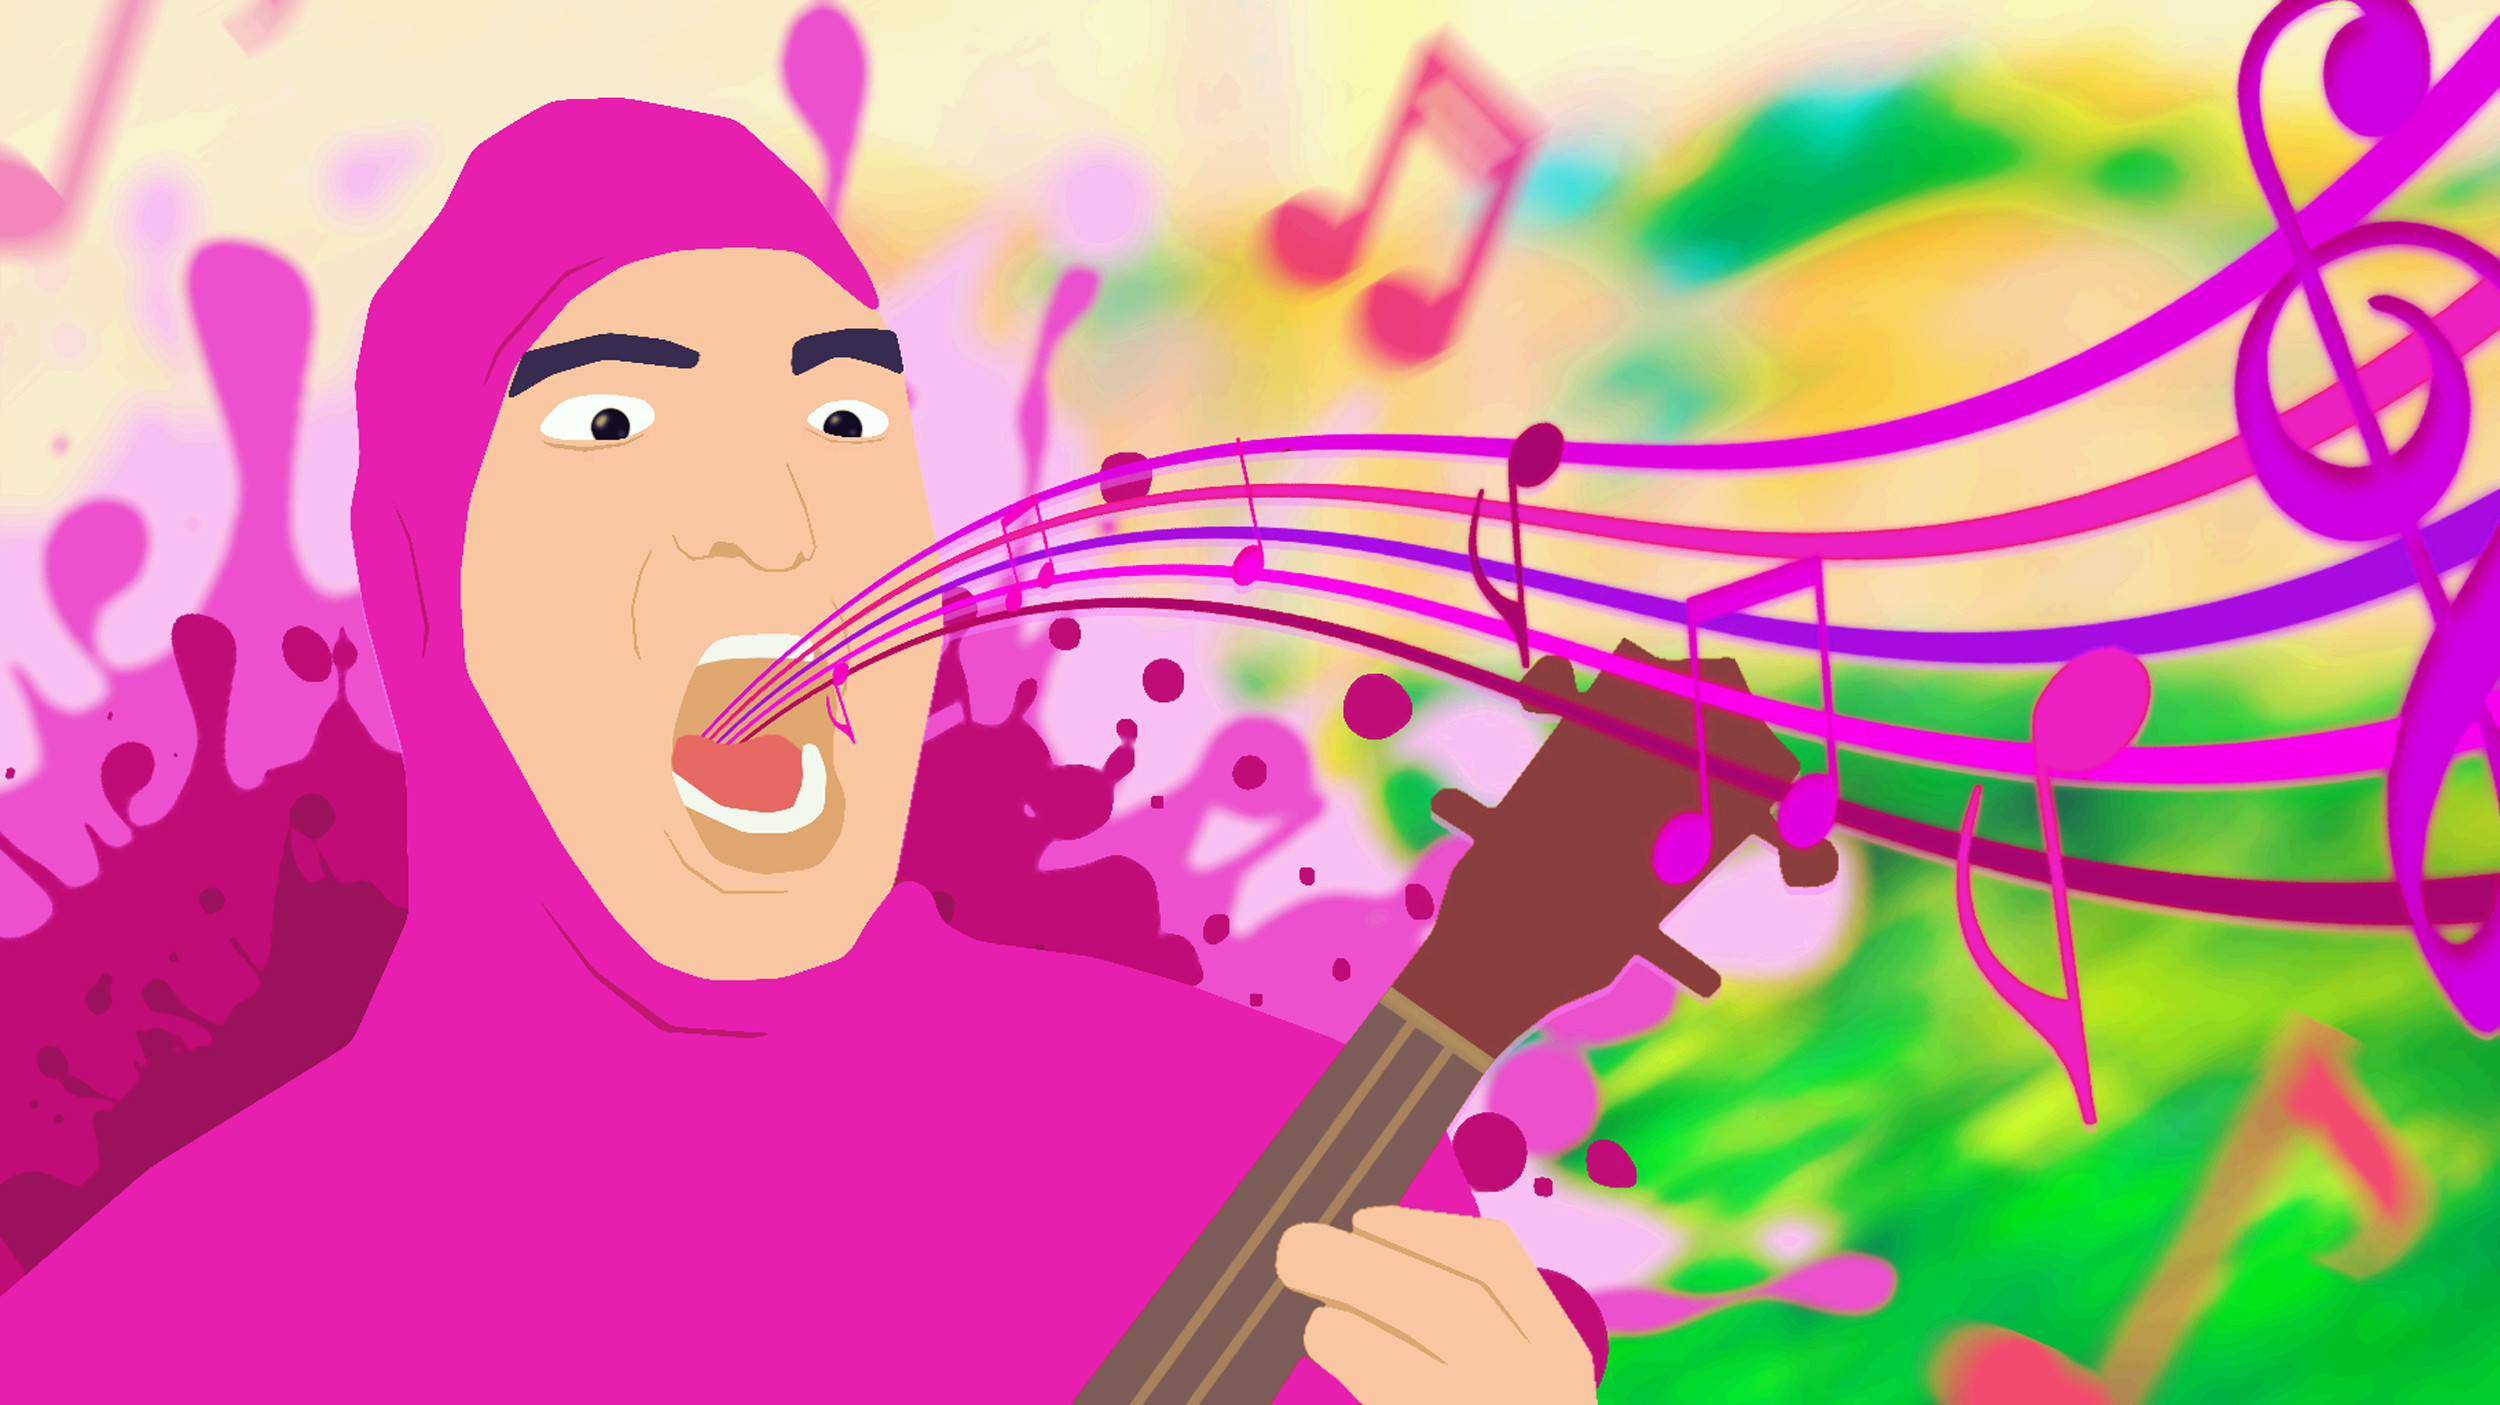 Pink Guy Wallpaper – 2500 x 1405 …